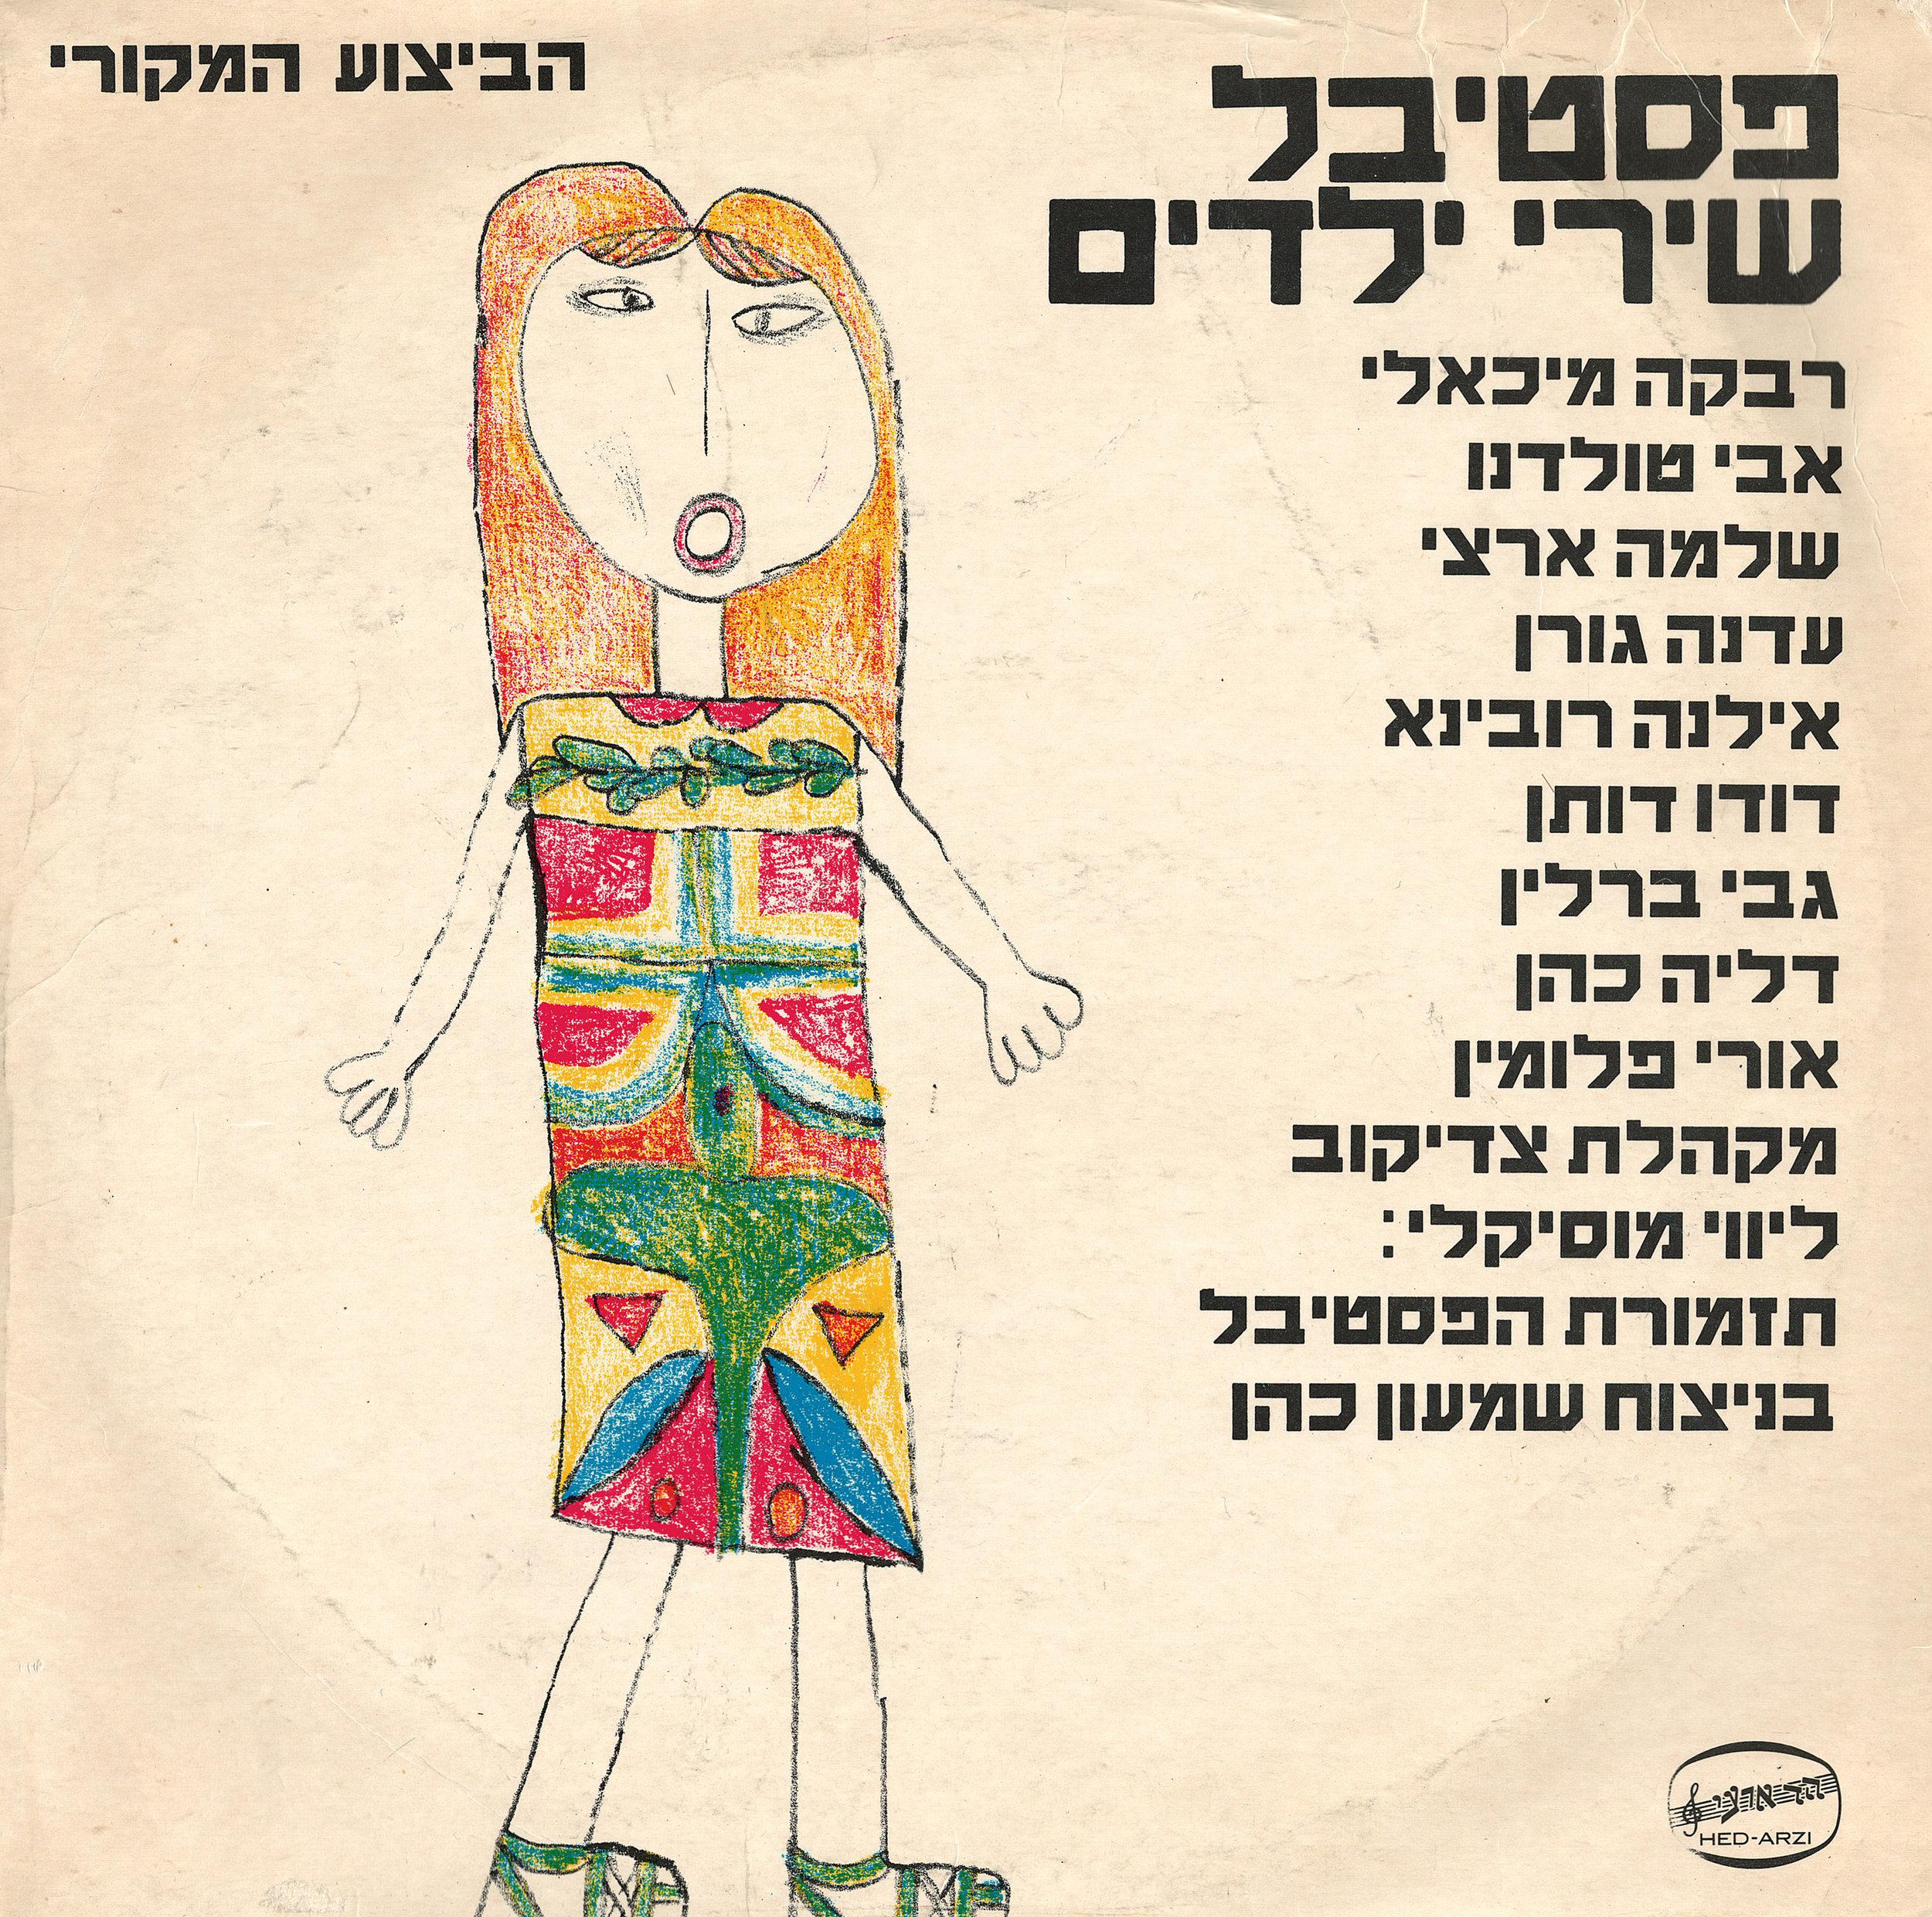 ISRAELI_RECORD_2_A.jpg